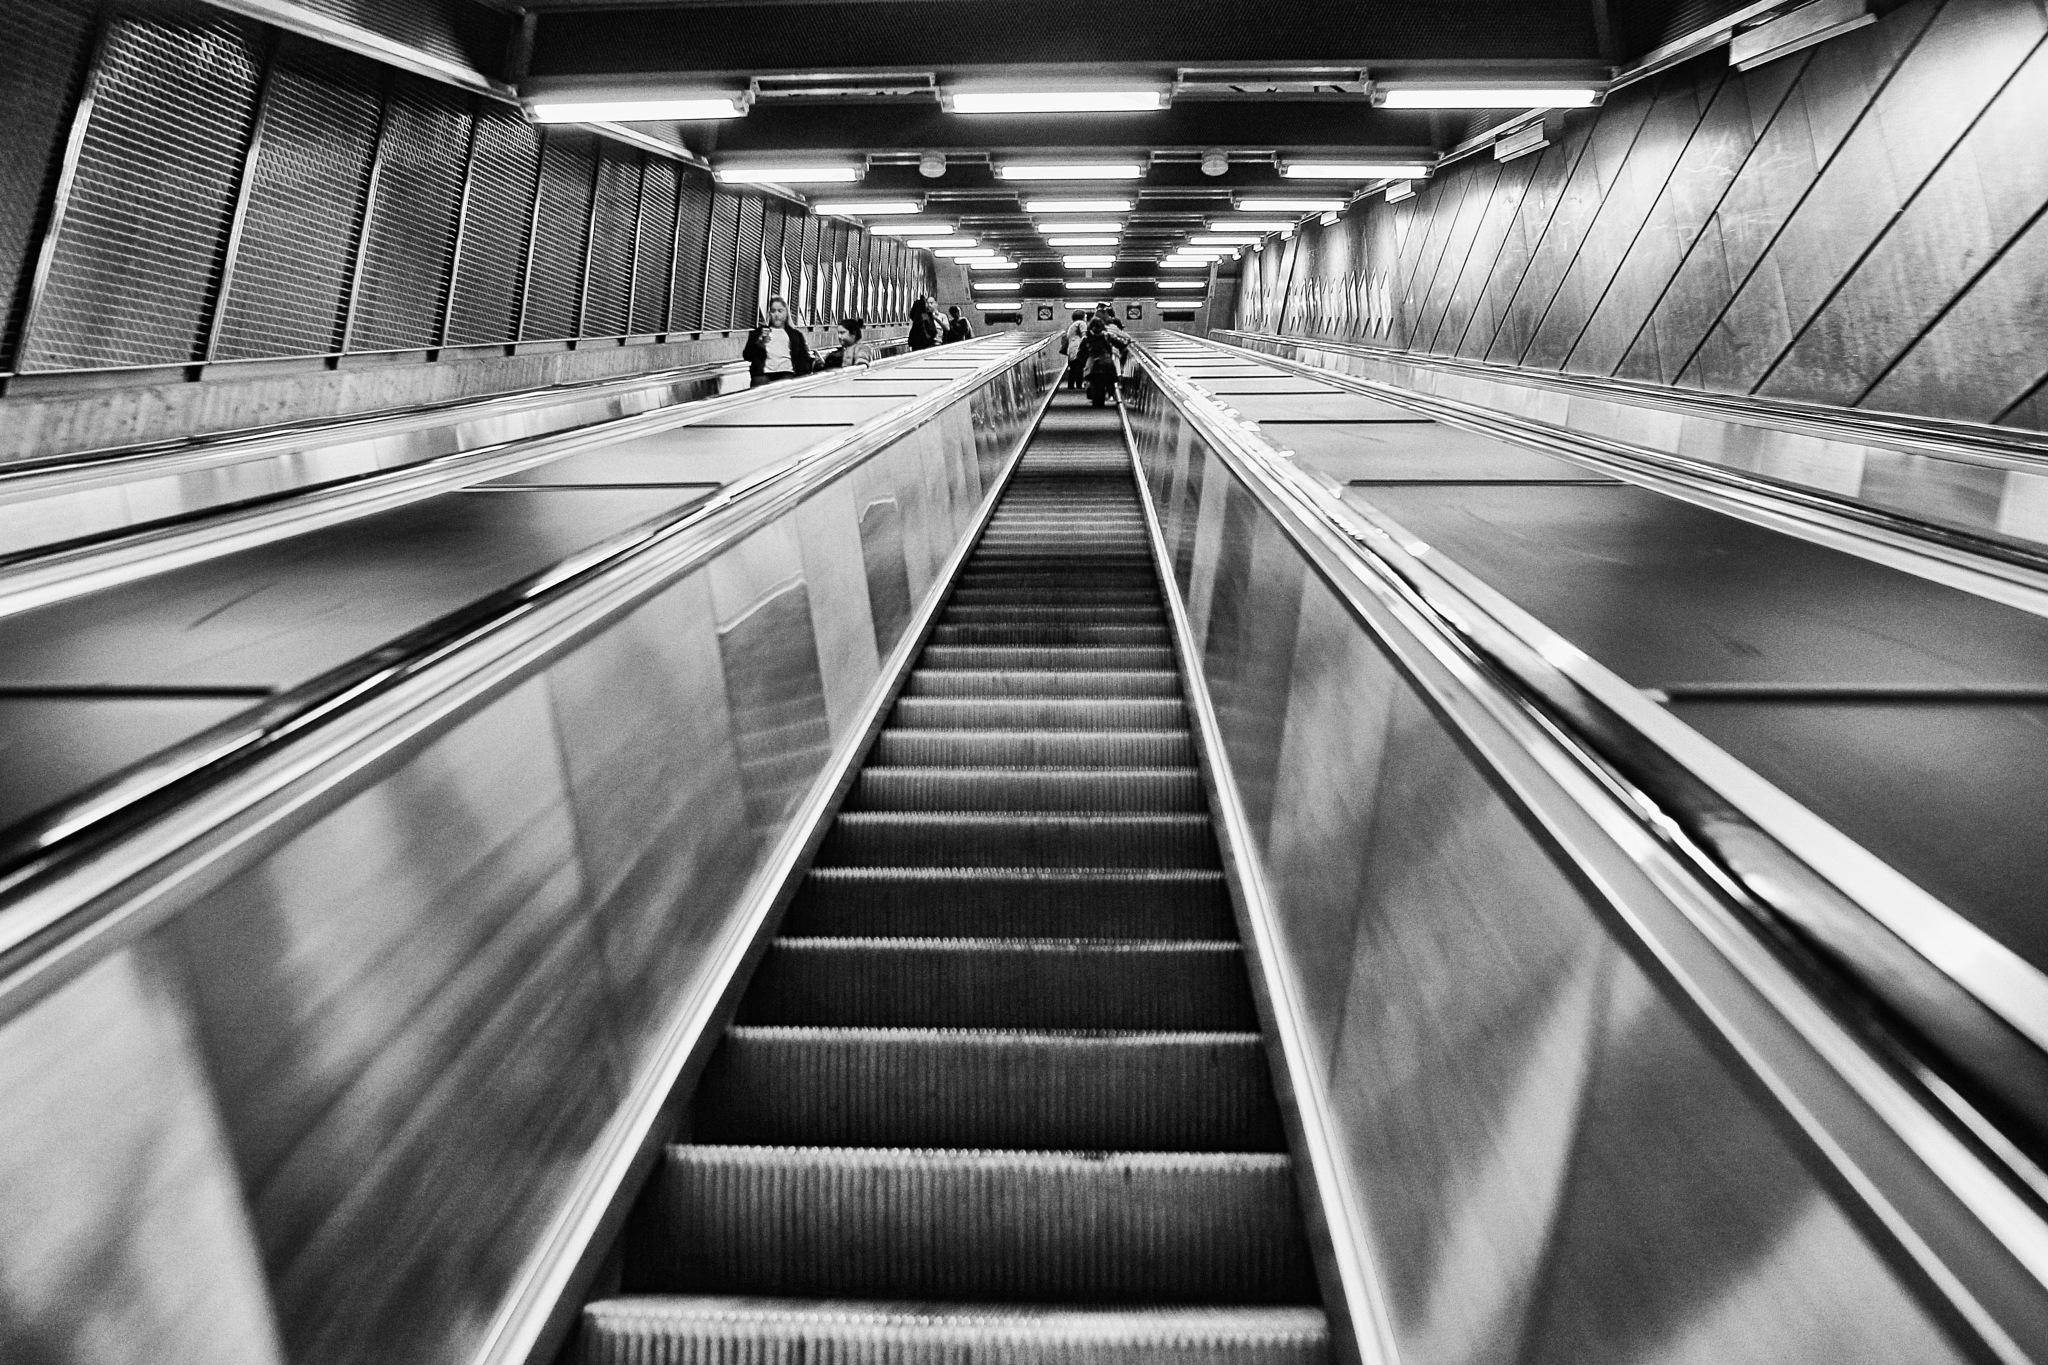 Escalator by leecj0129